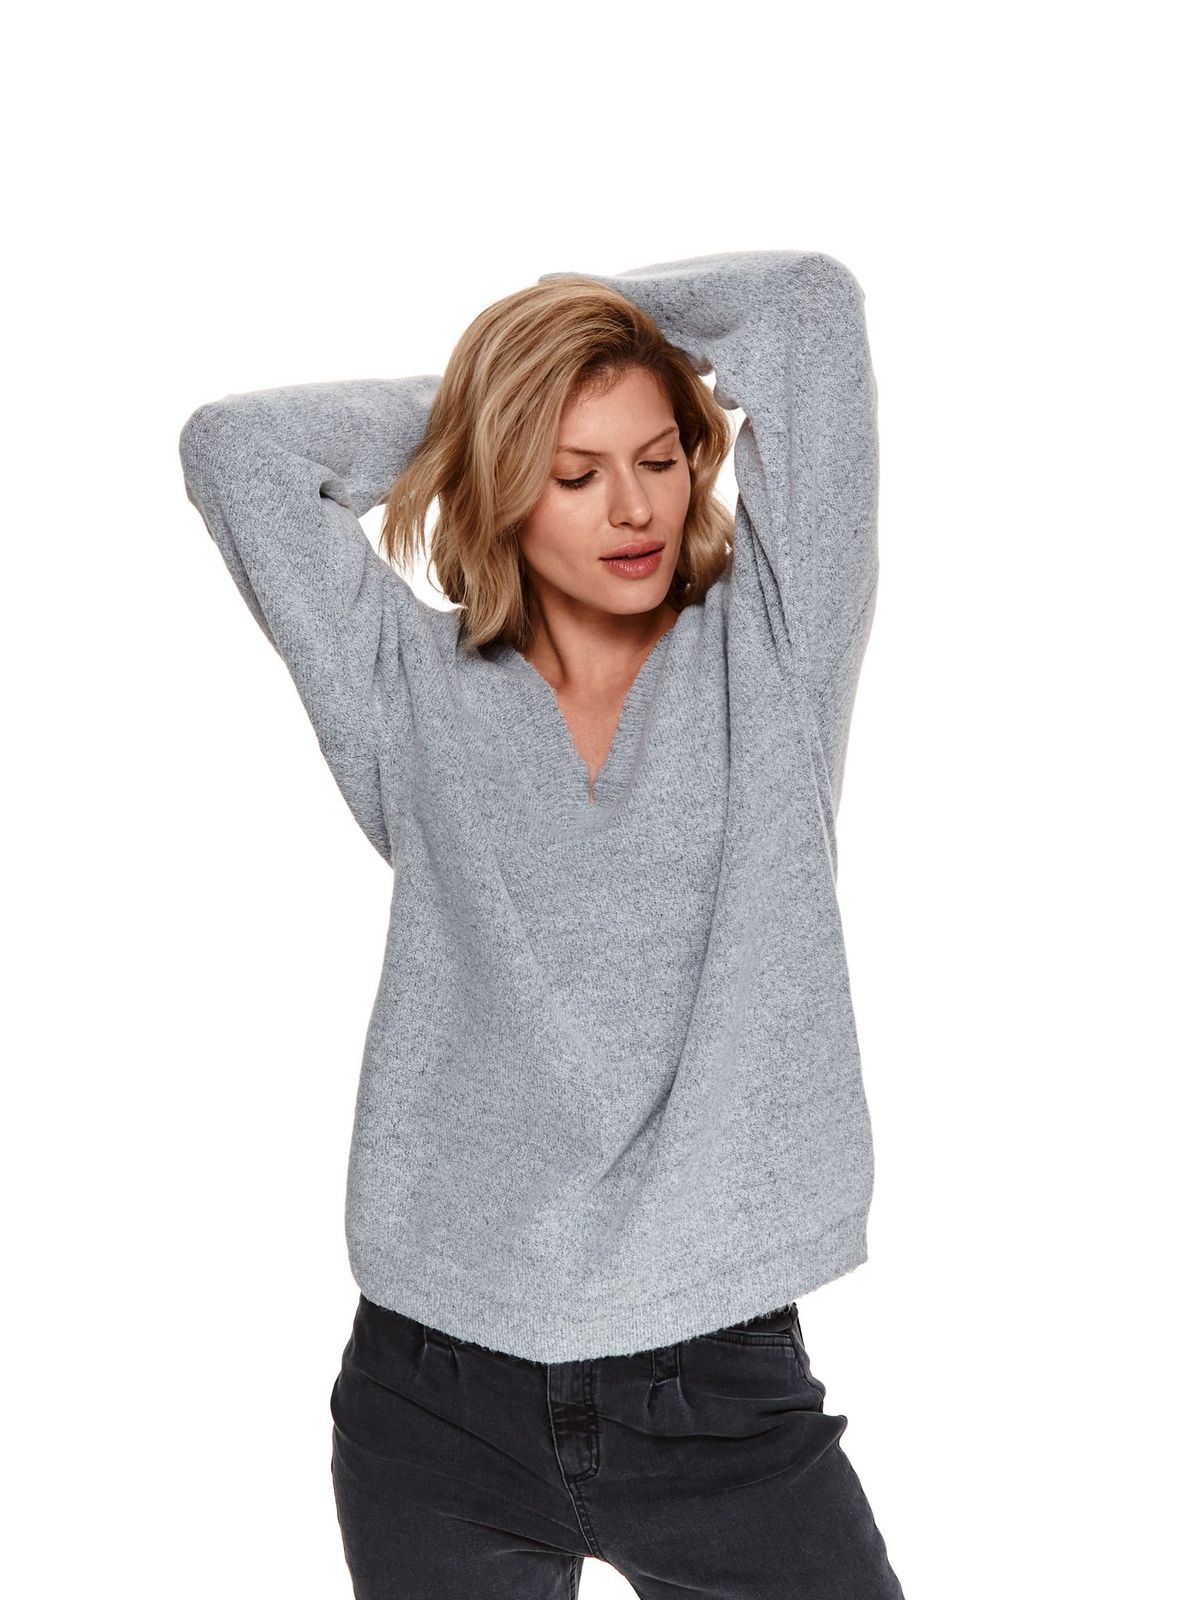 Pulover gri-deschis Top Secret din tricot pufos cu croi larg